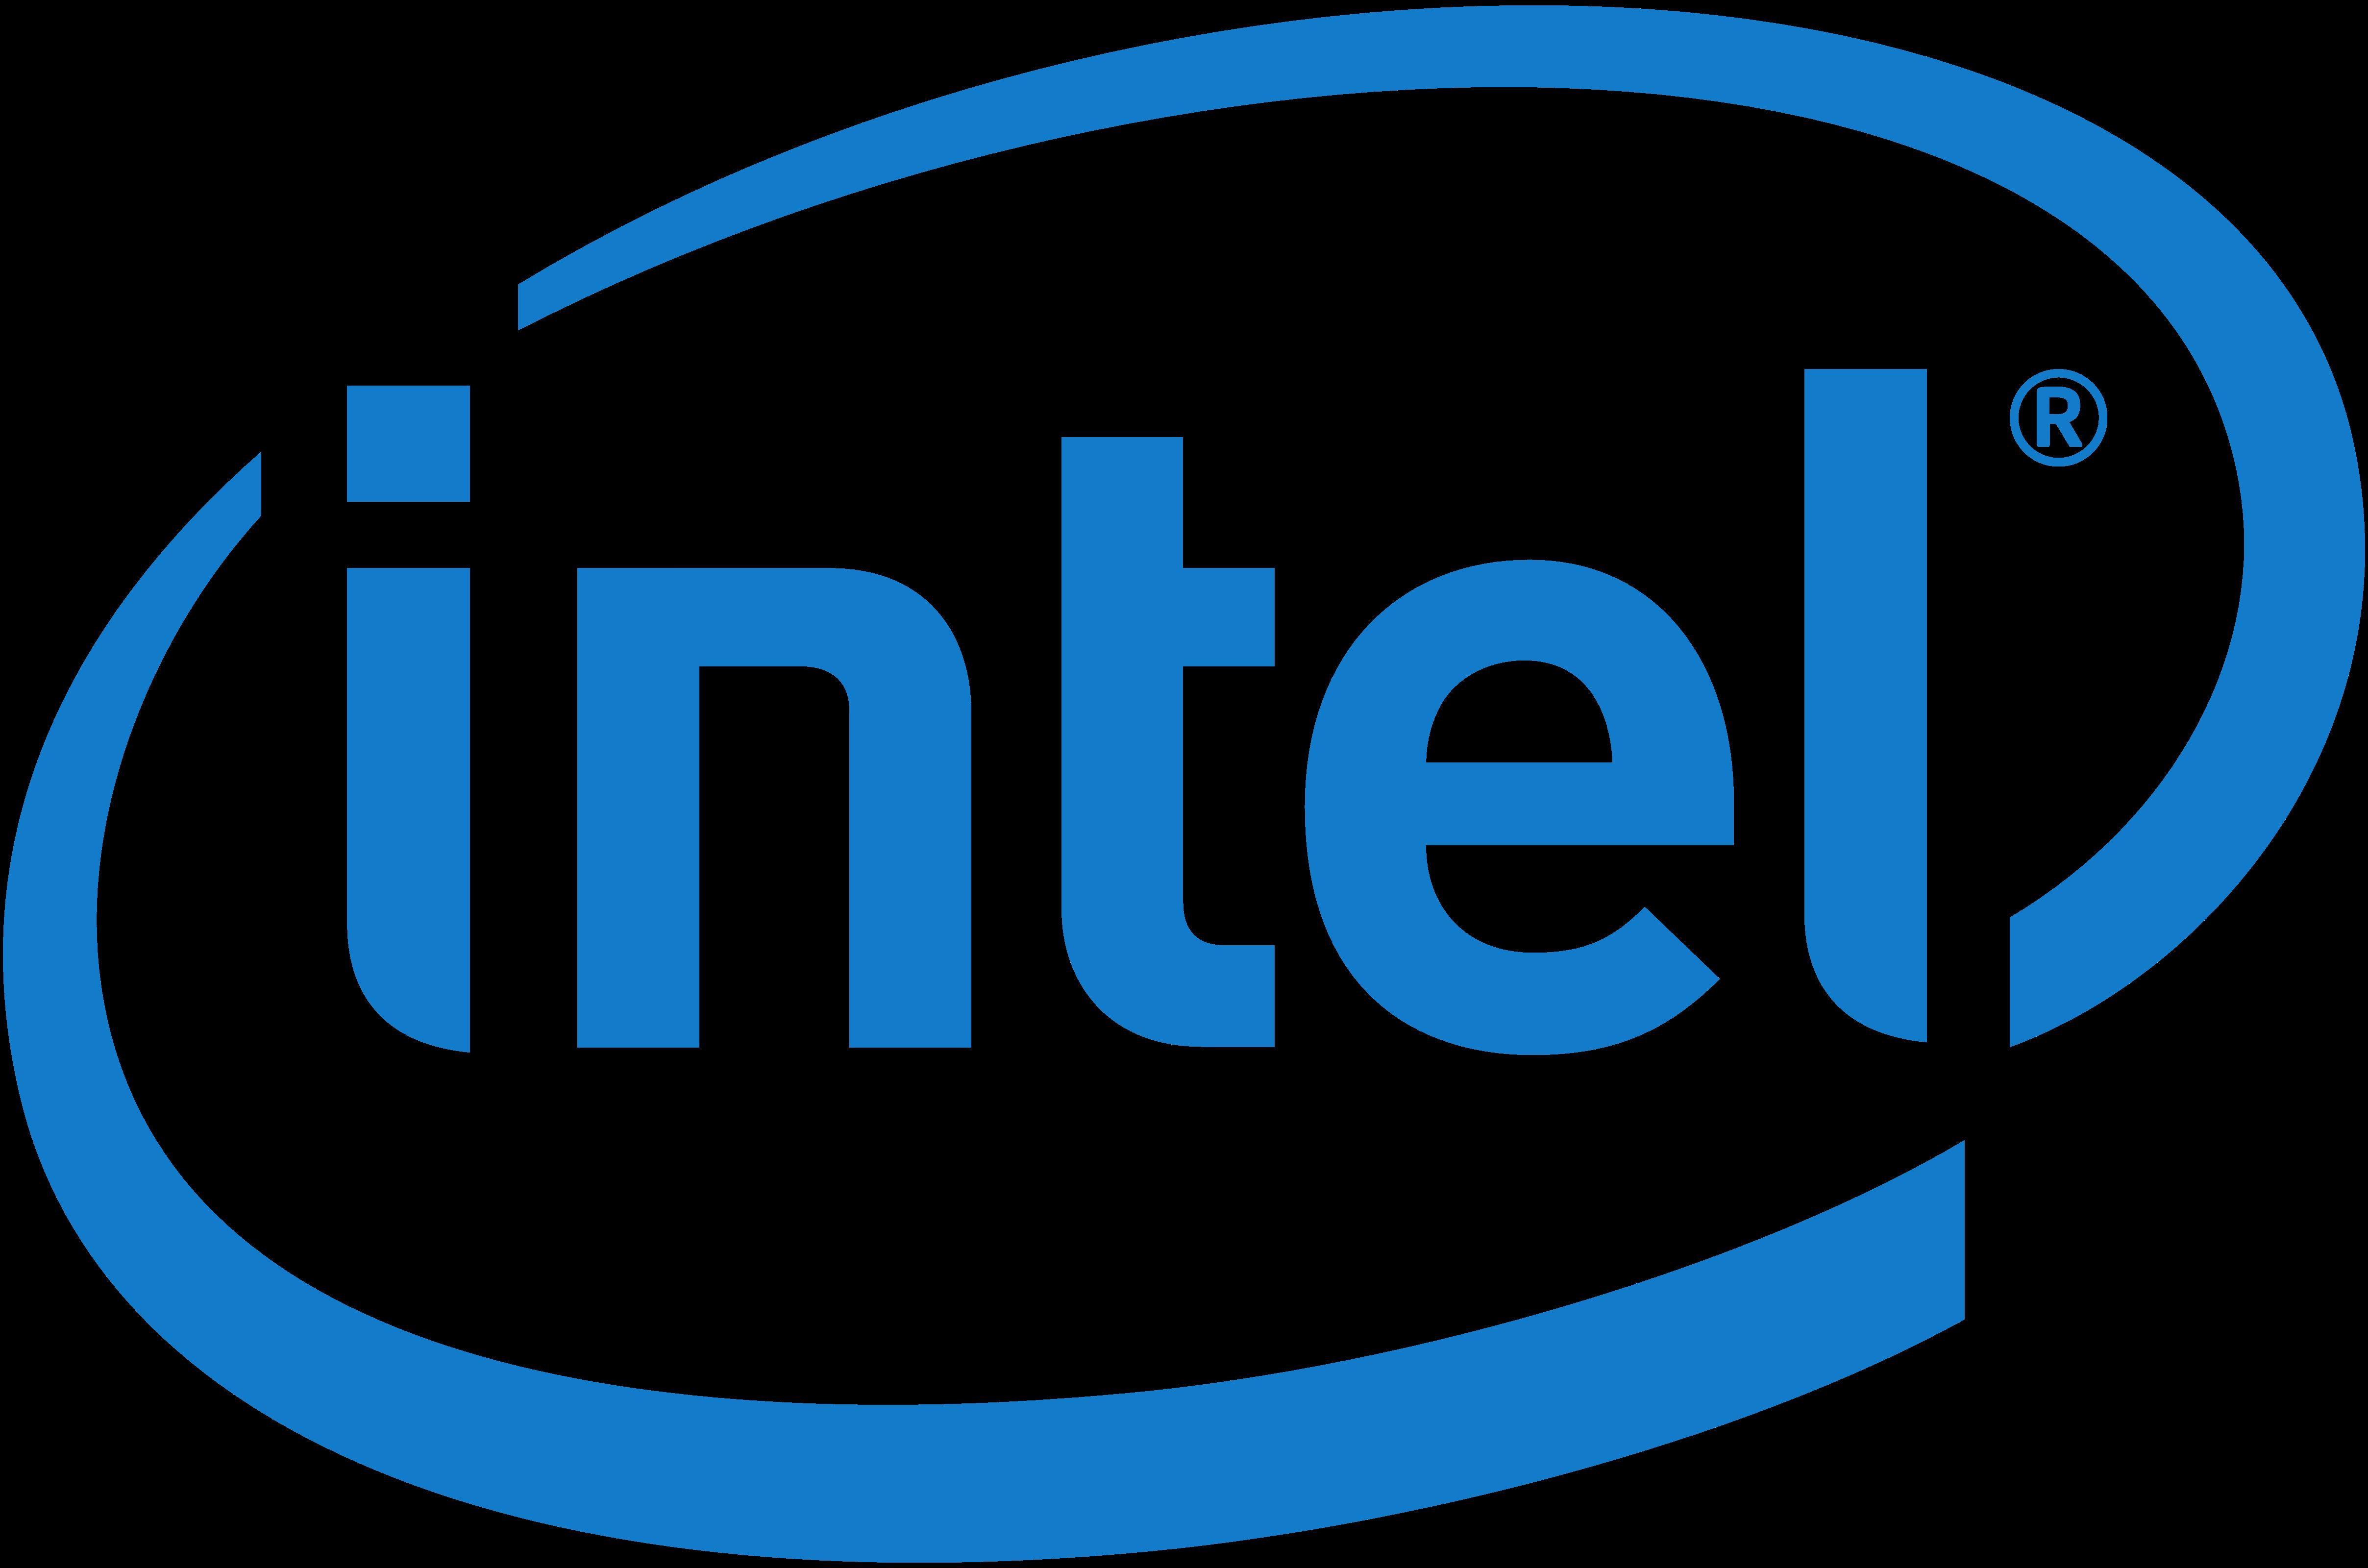 Intel Logo, Png, Transparent, Huge - Intel type, Transparent background PNG HD thumbnail